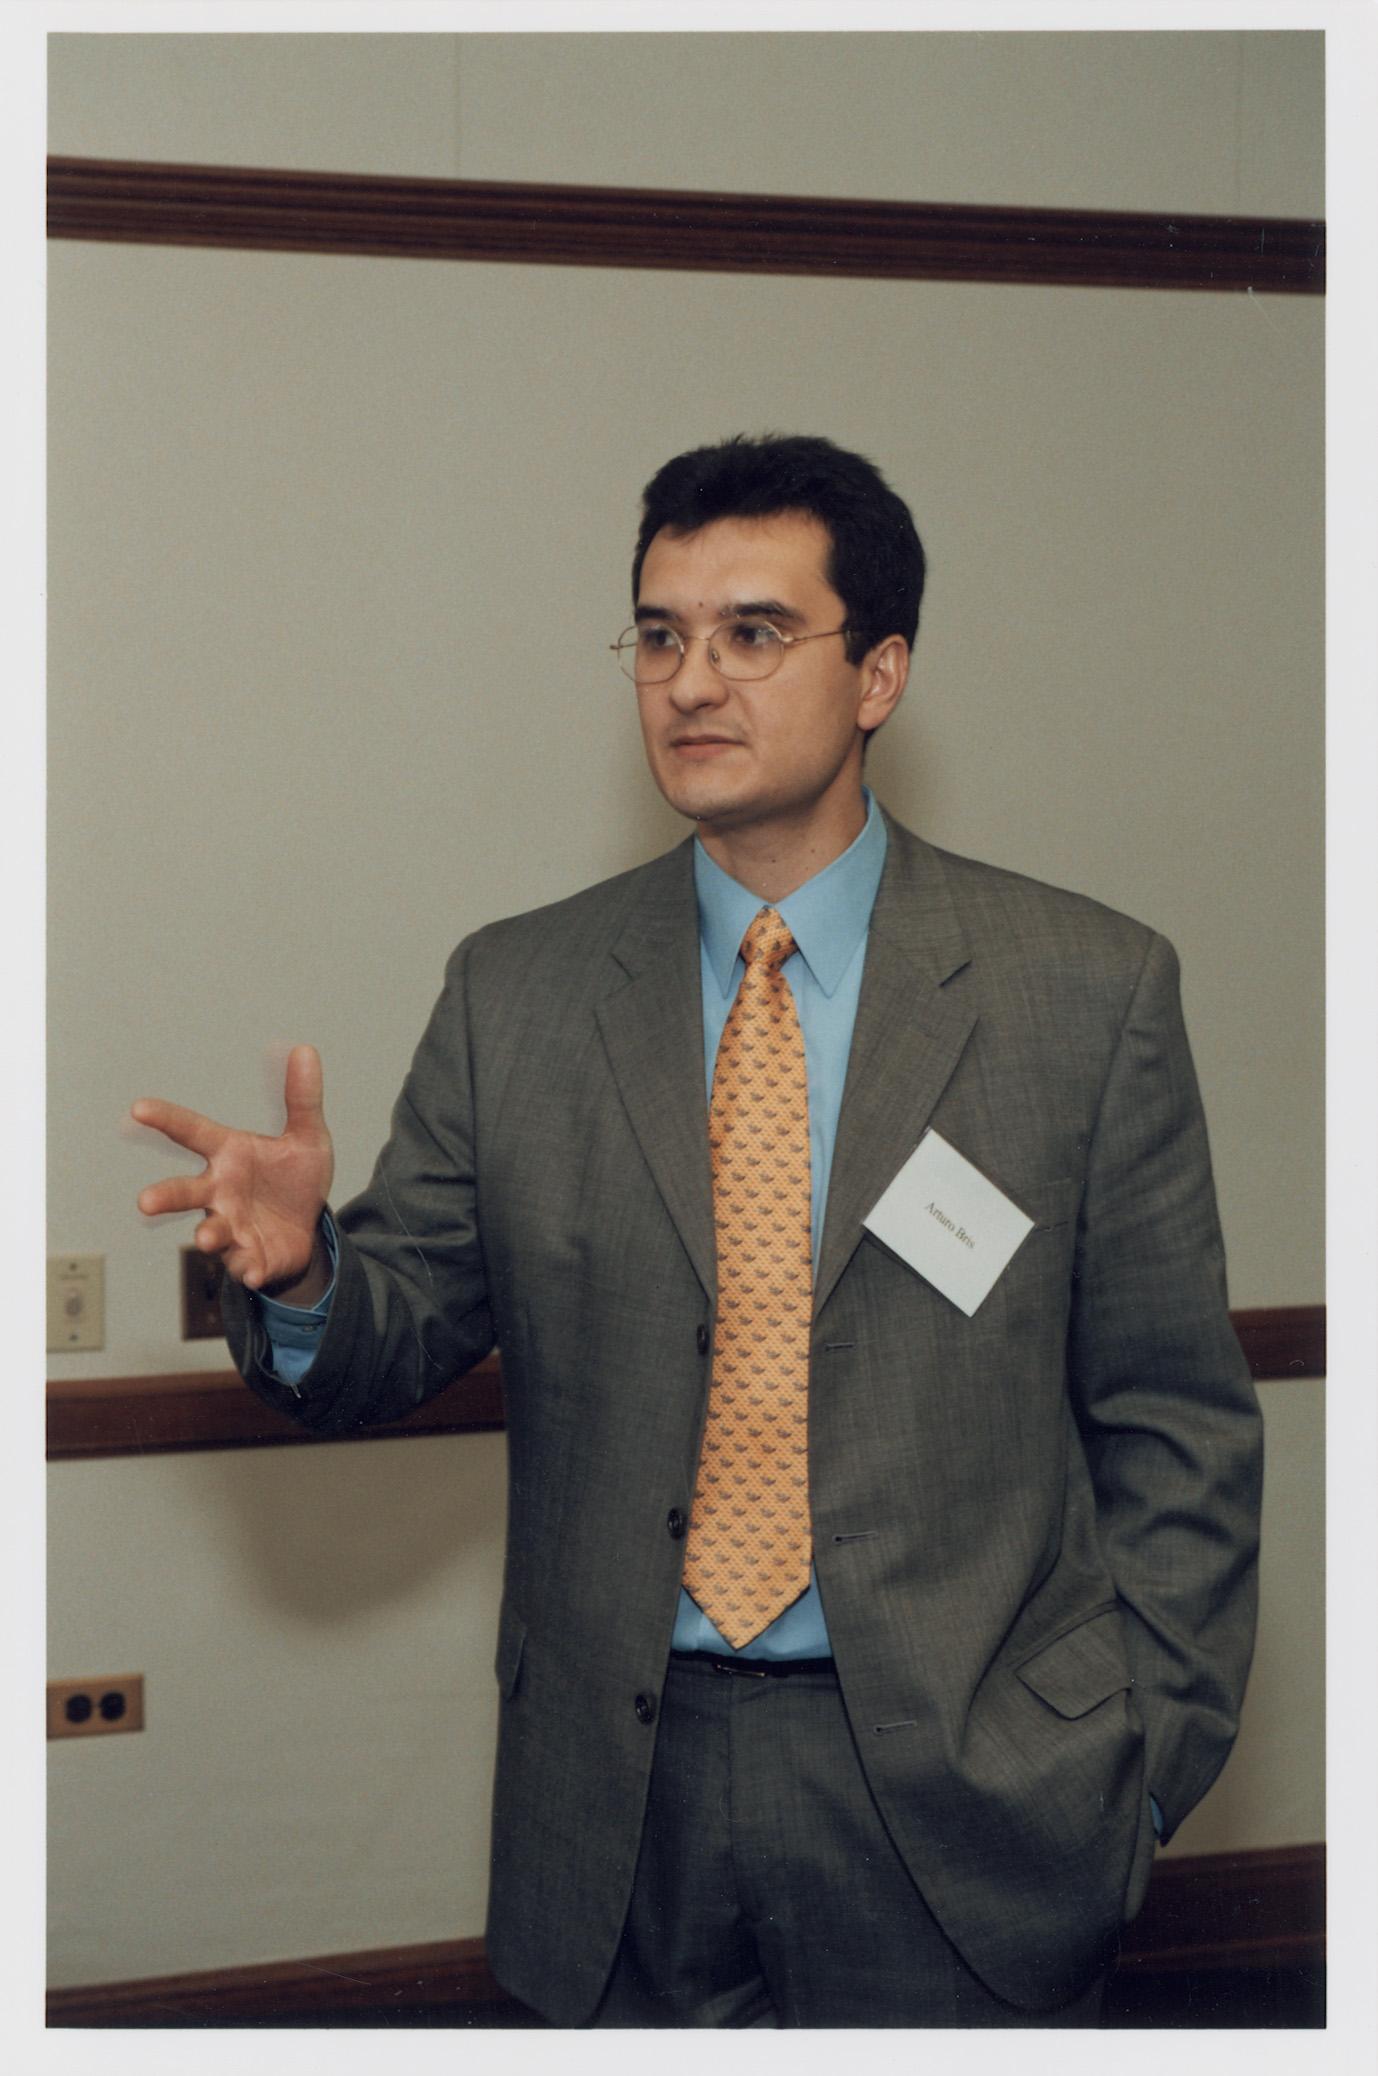 Yale SOM Prof. Arturo Bris